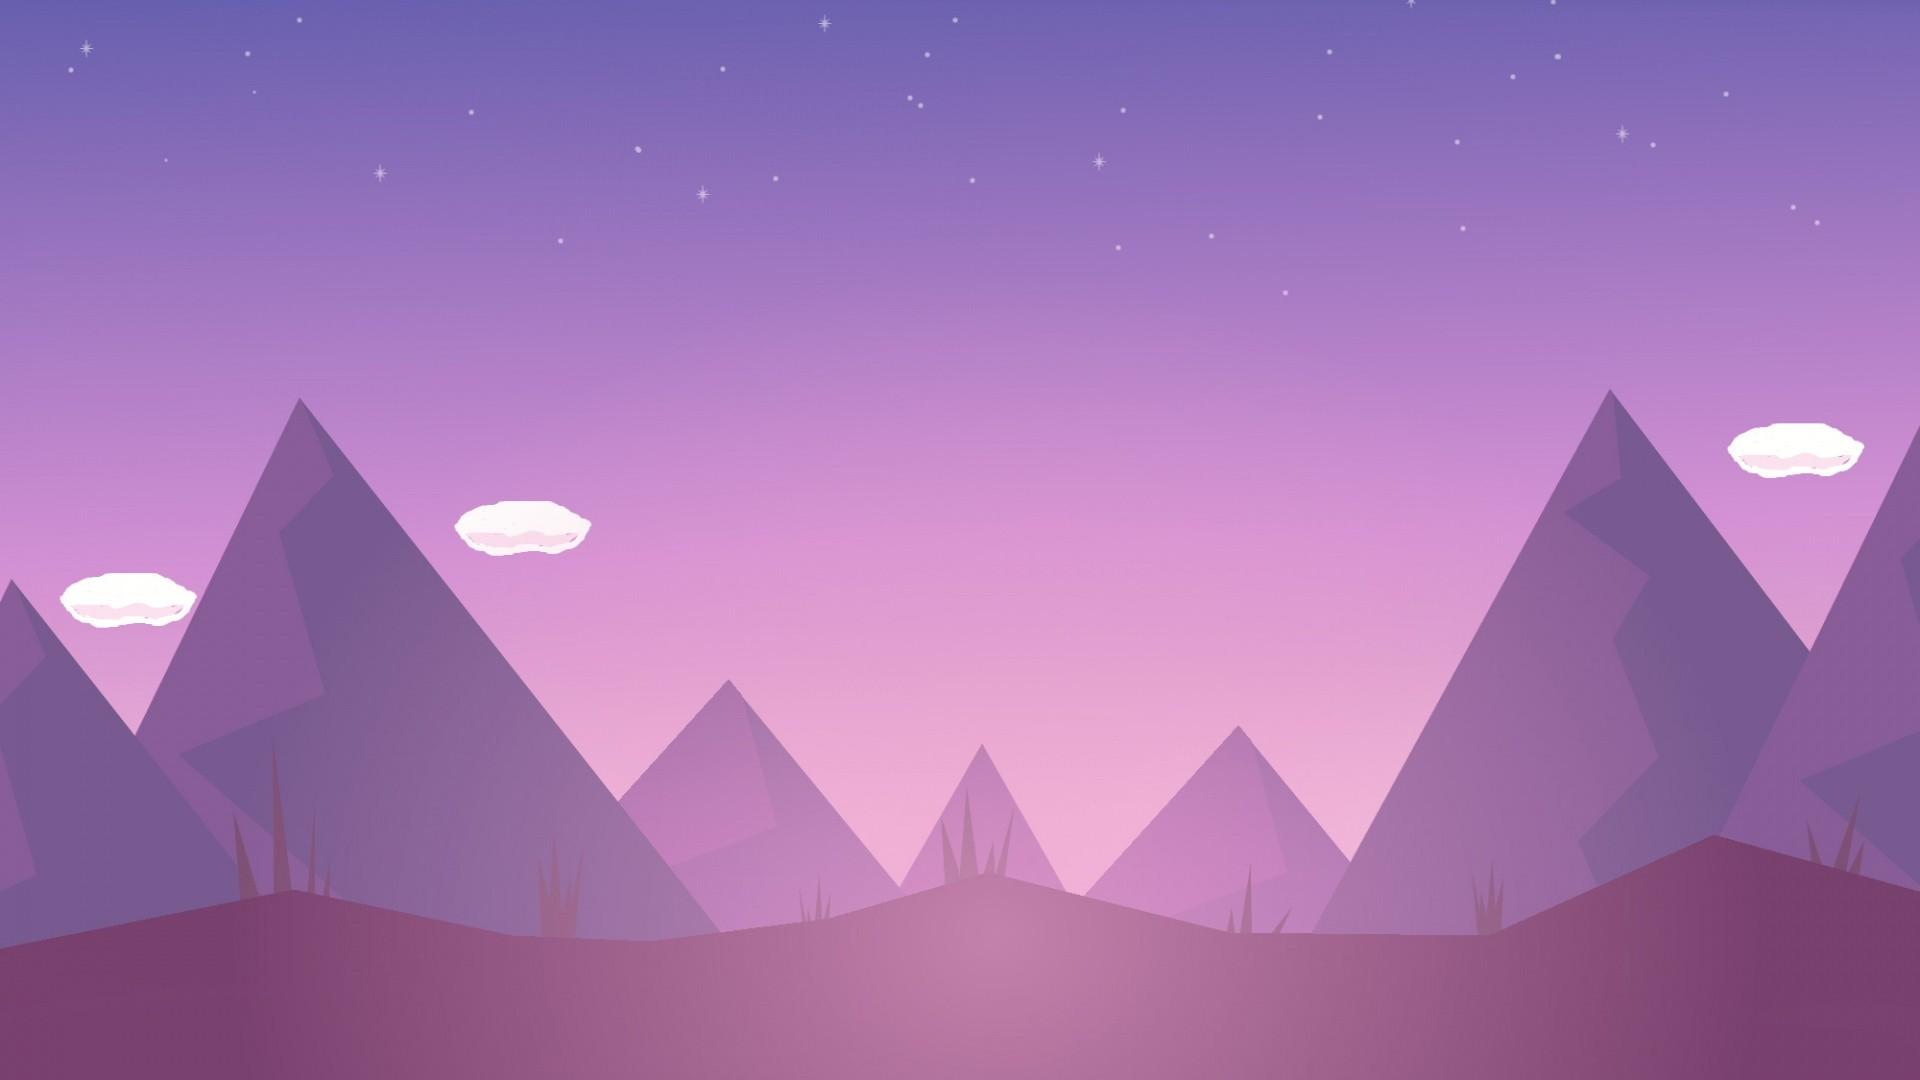 Sky Minimalist Desktop Wallpaper